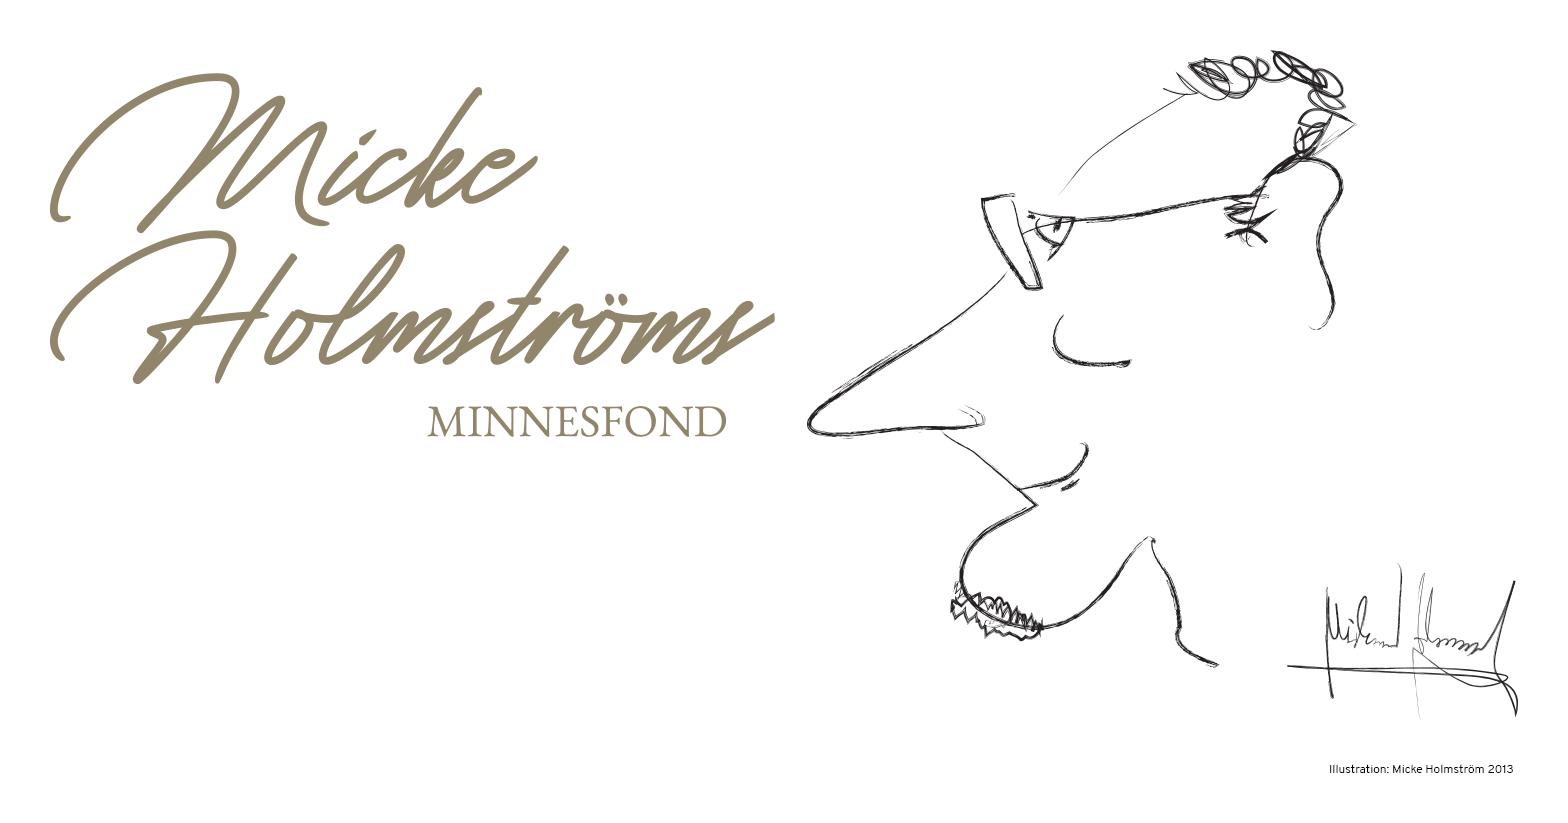 Micke Holmströms Minnesfond